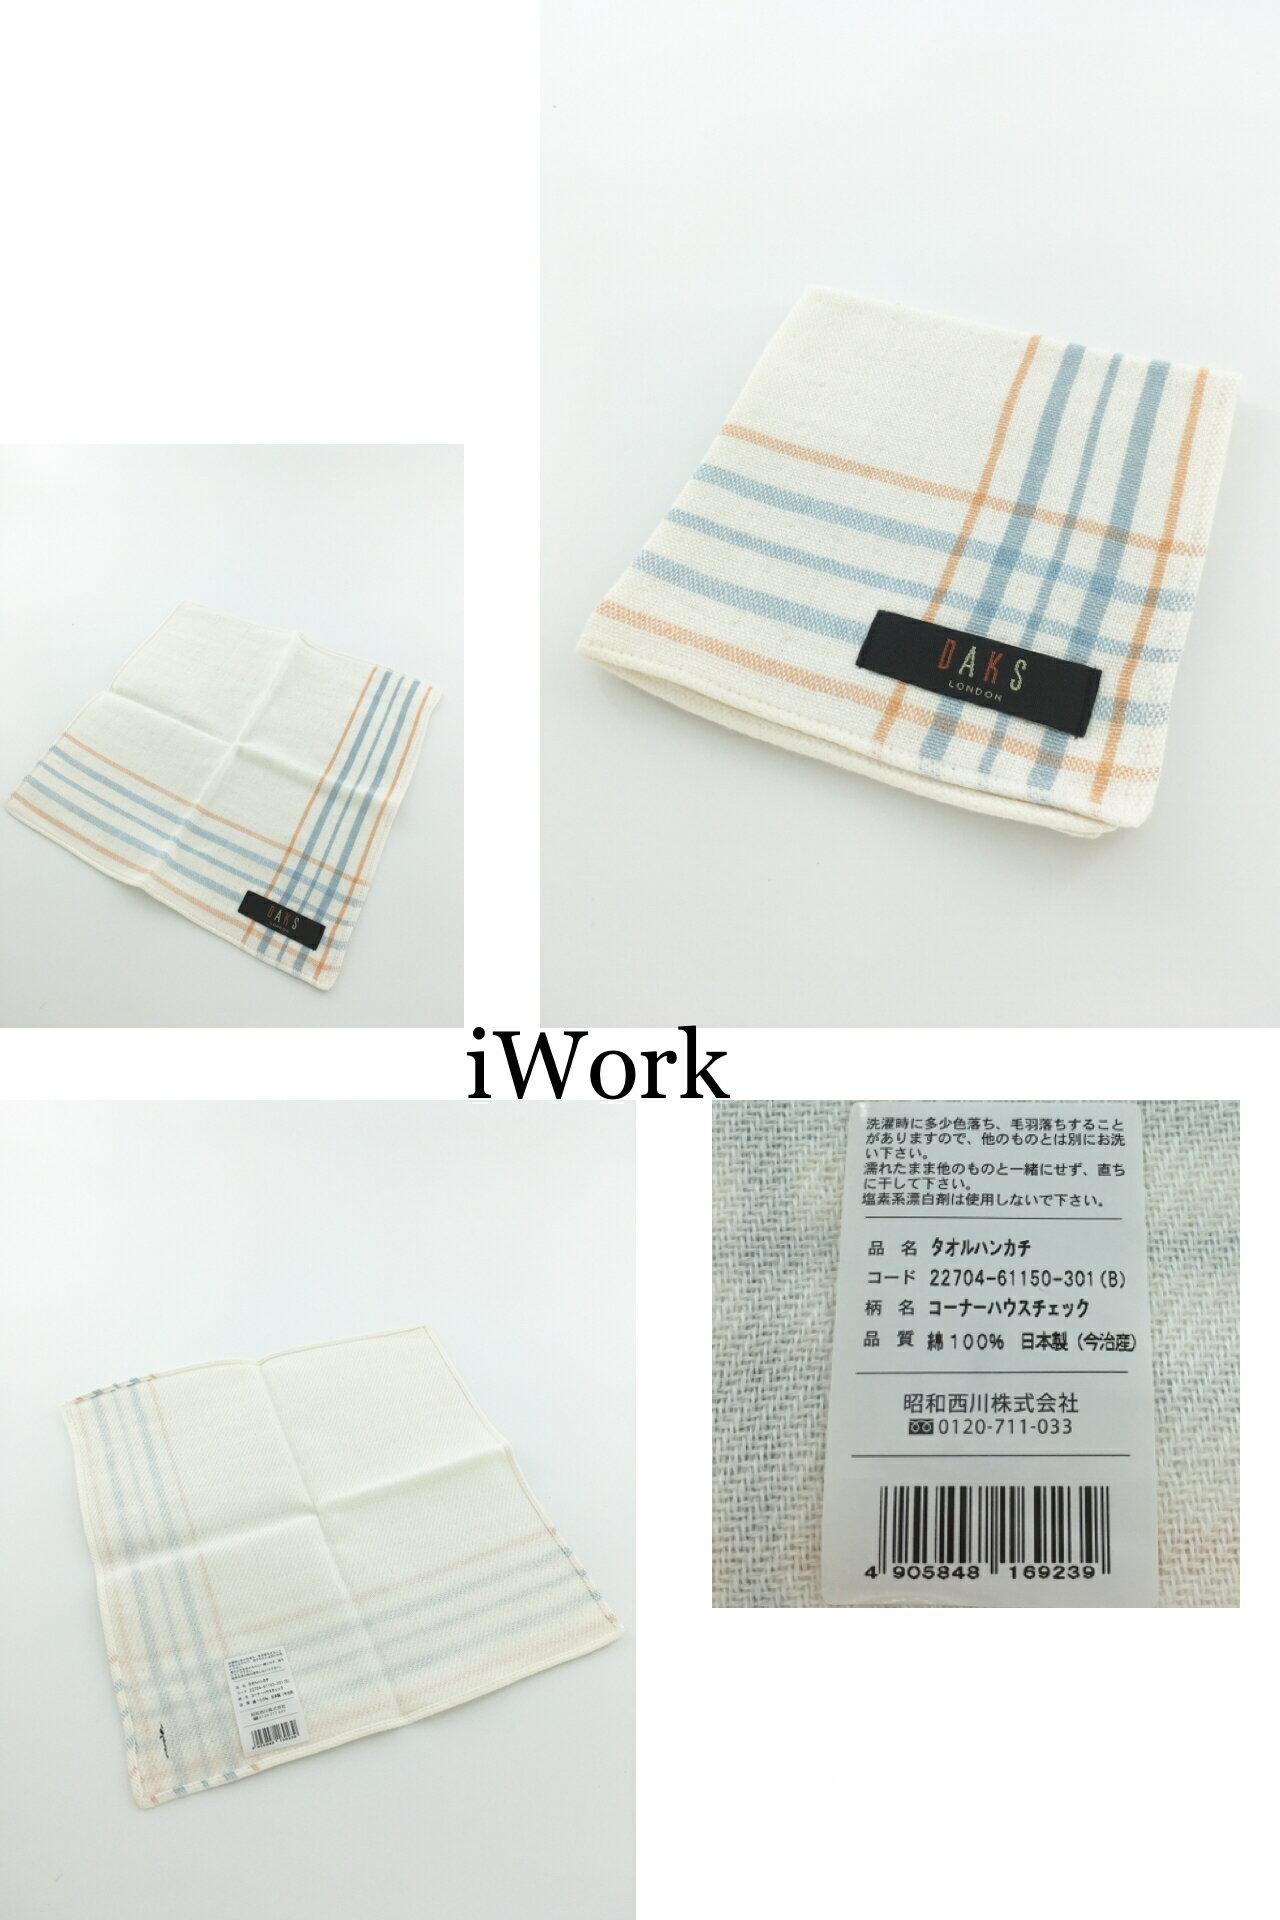 【iWork】10021《DAKS》經典格紋攜帶方便小方巾 ,質感細緻、輕盈、漂亮,顏色白色格紋〔經典、格紋、小方巾、方便、好用〕